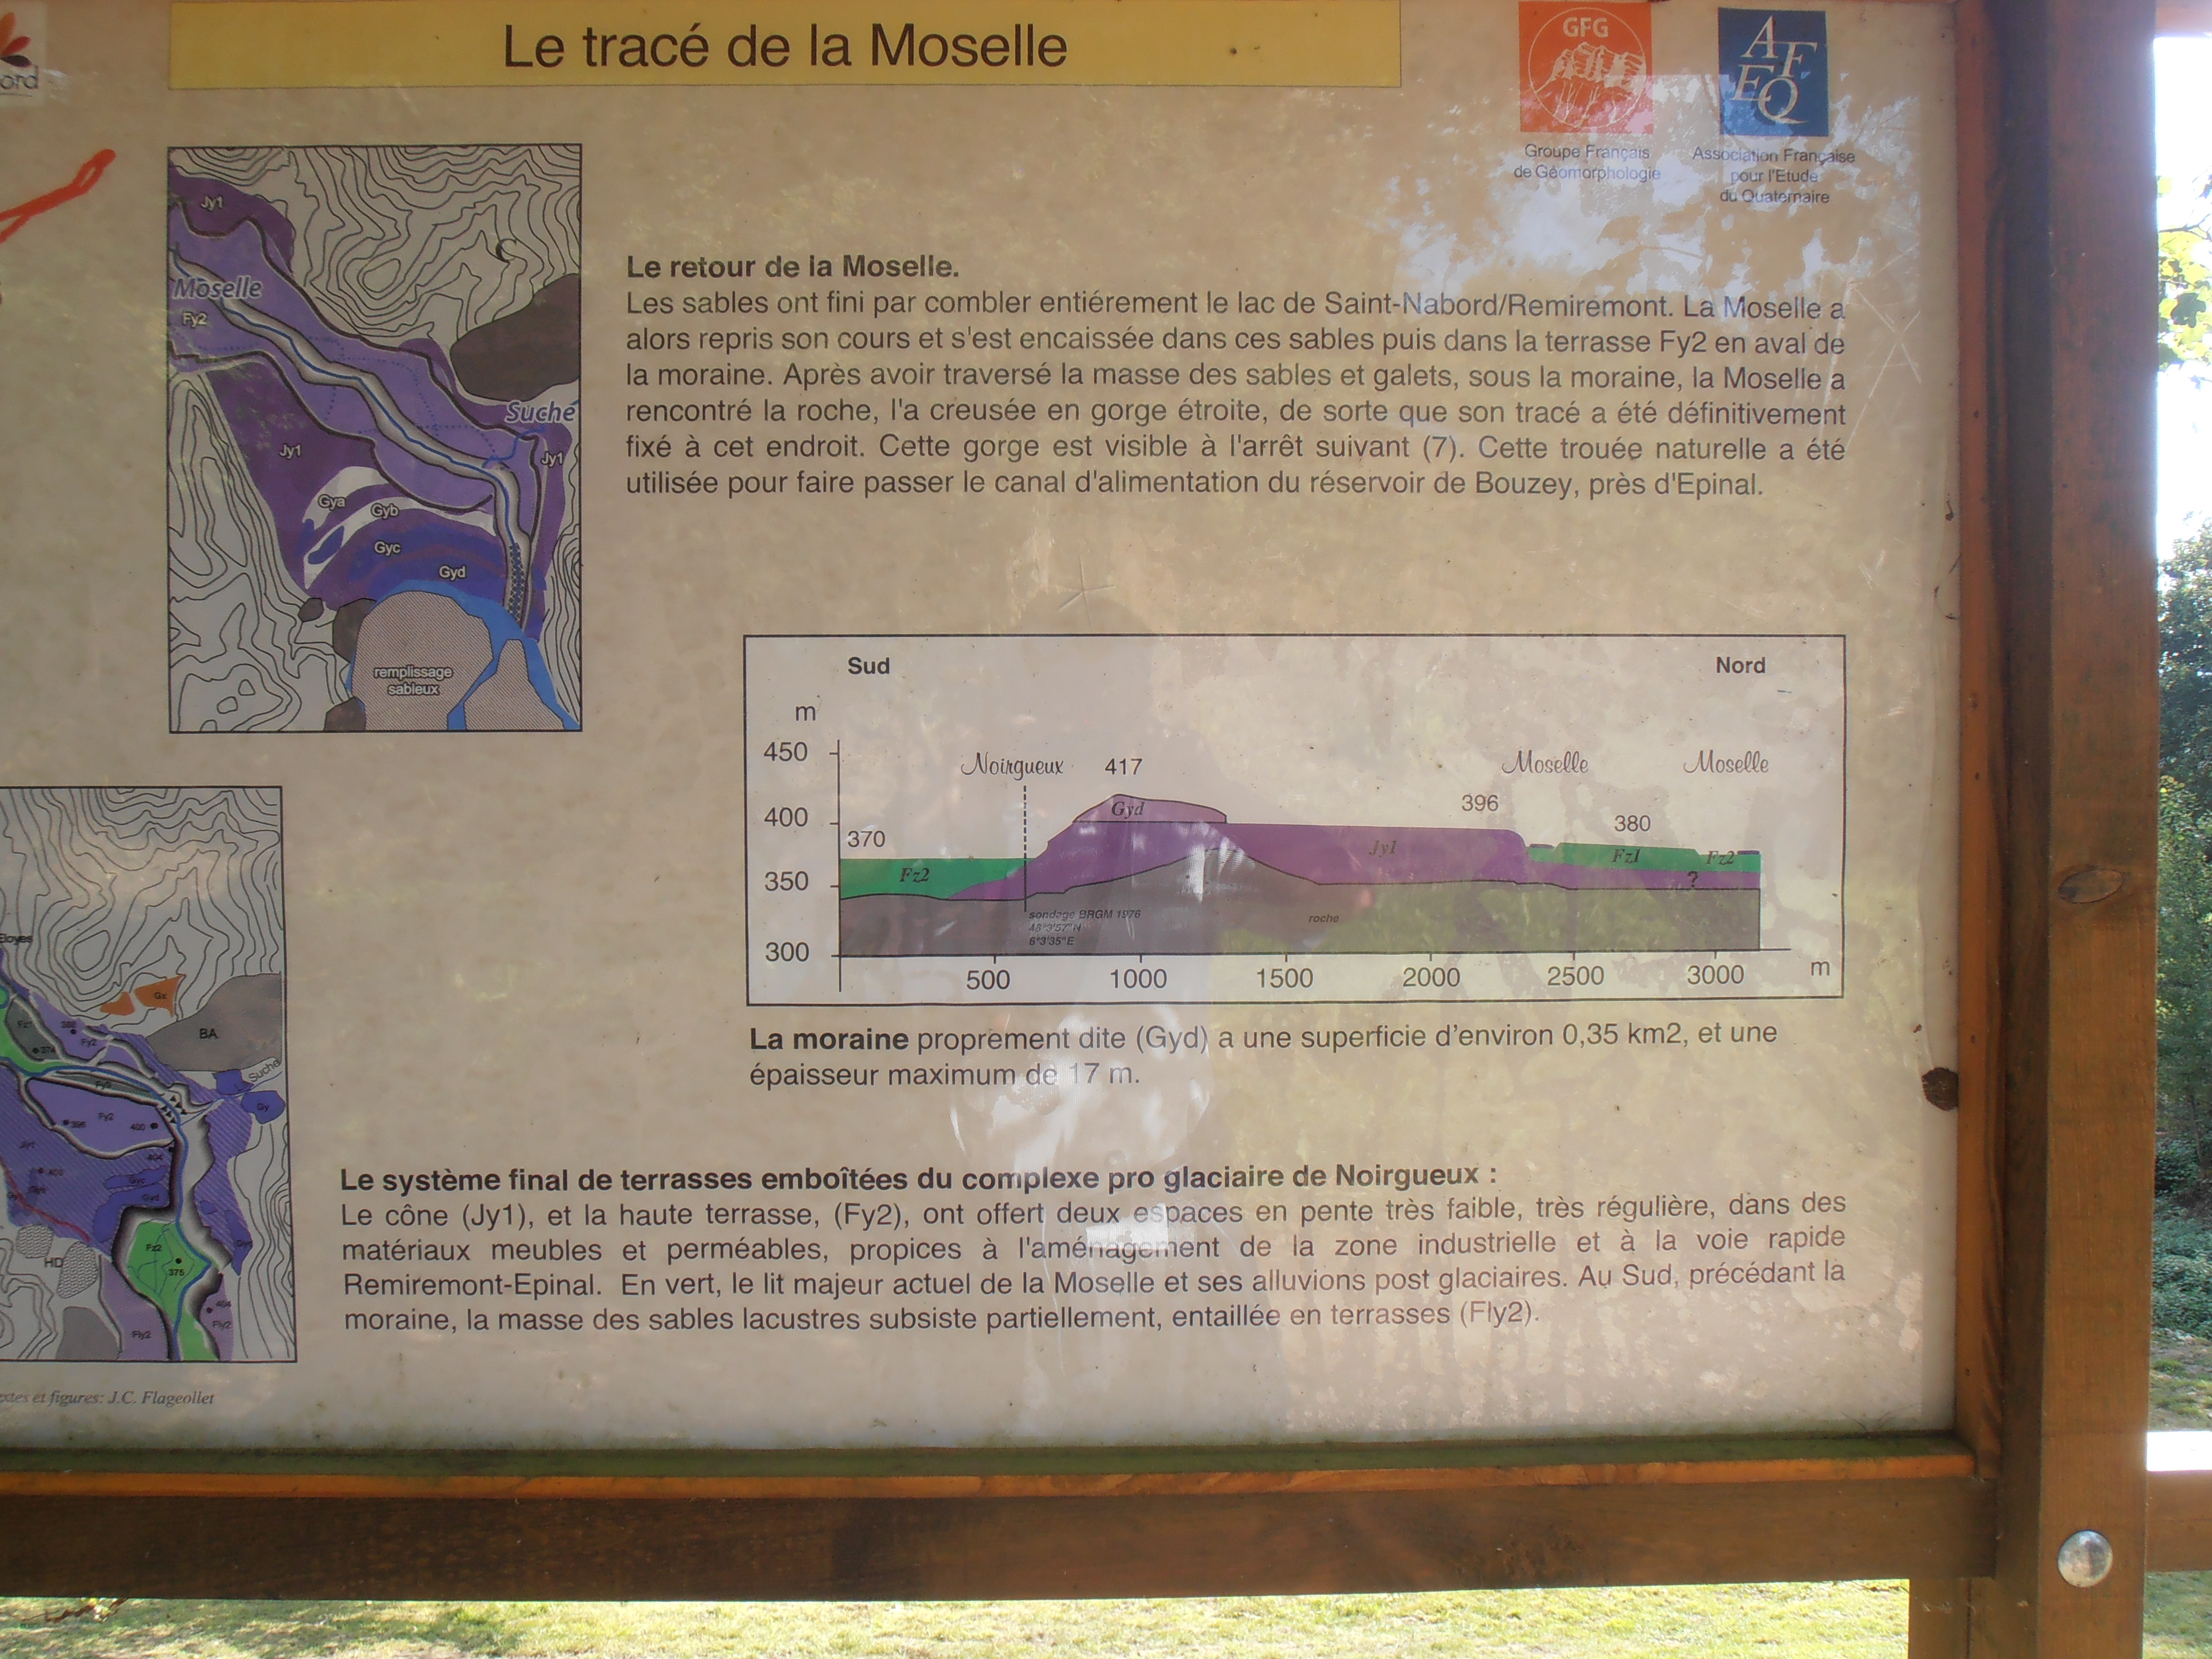 Fichier 6 1 Le Trace De La Moselle Jpg Wikipedia